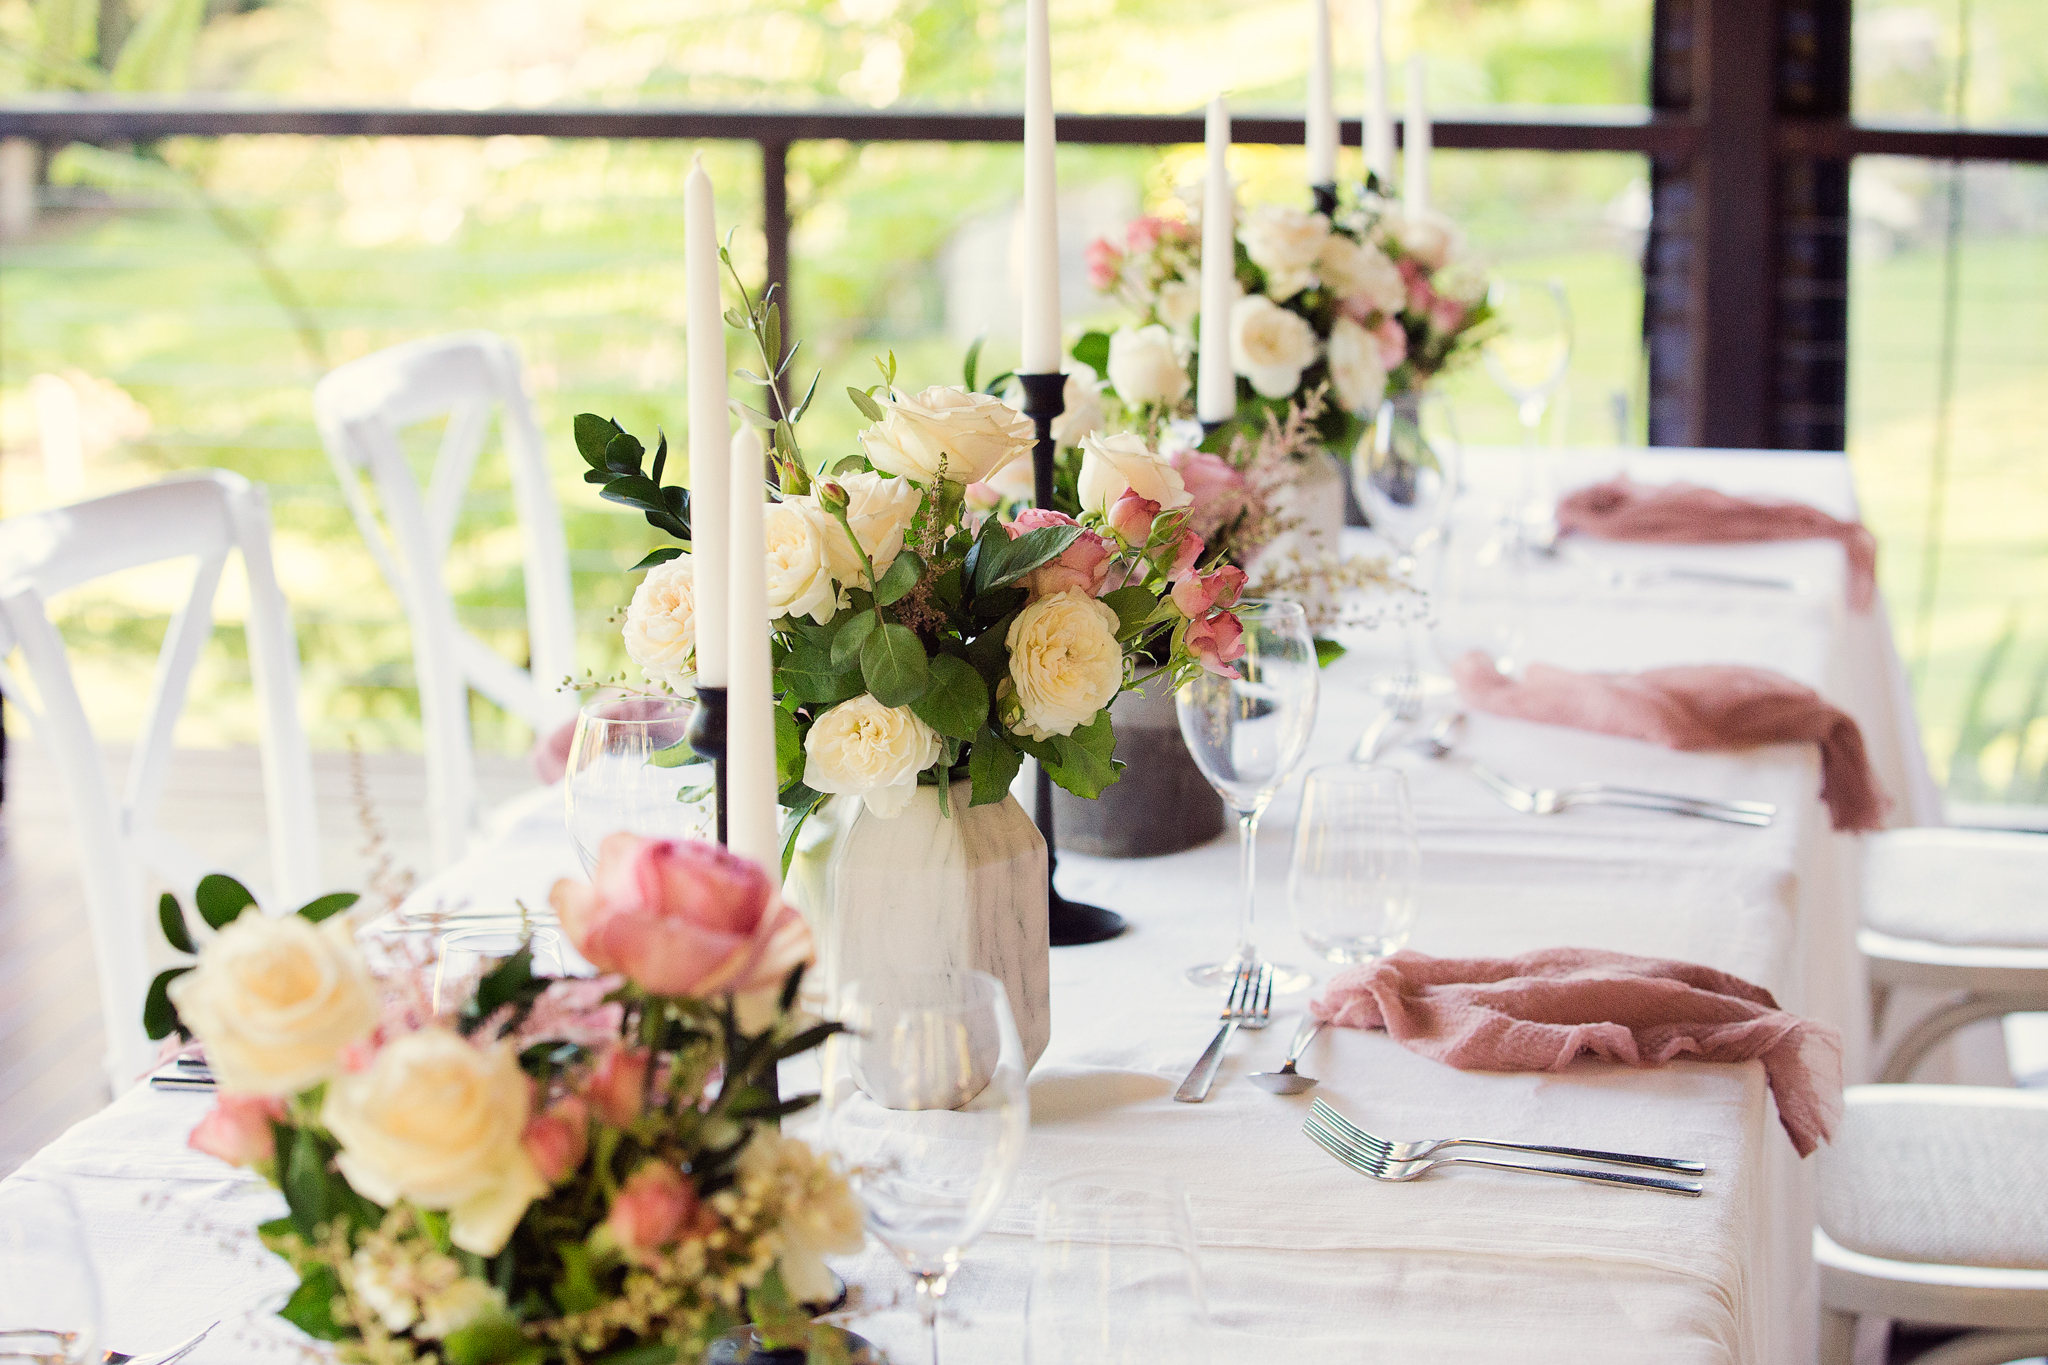 Stunning Table Arrangements